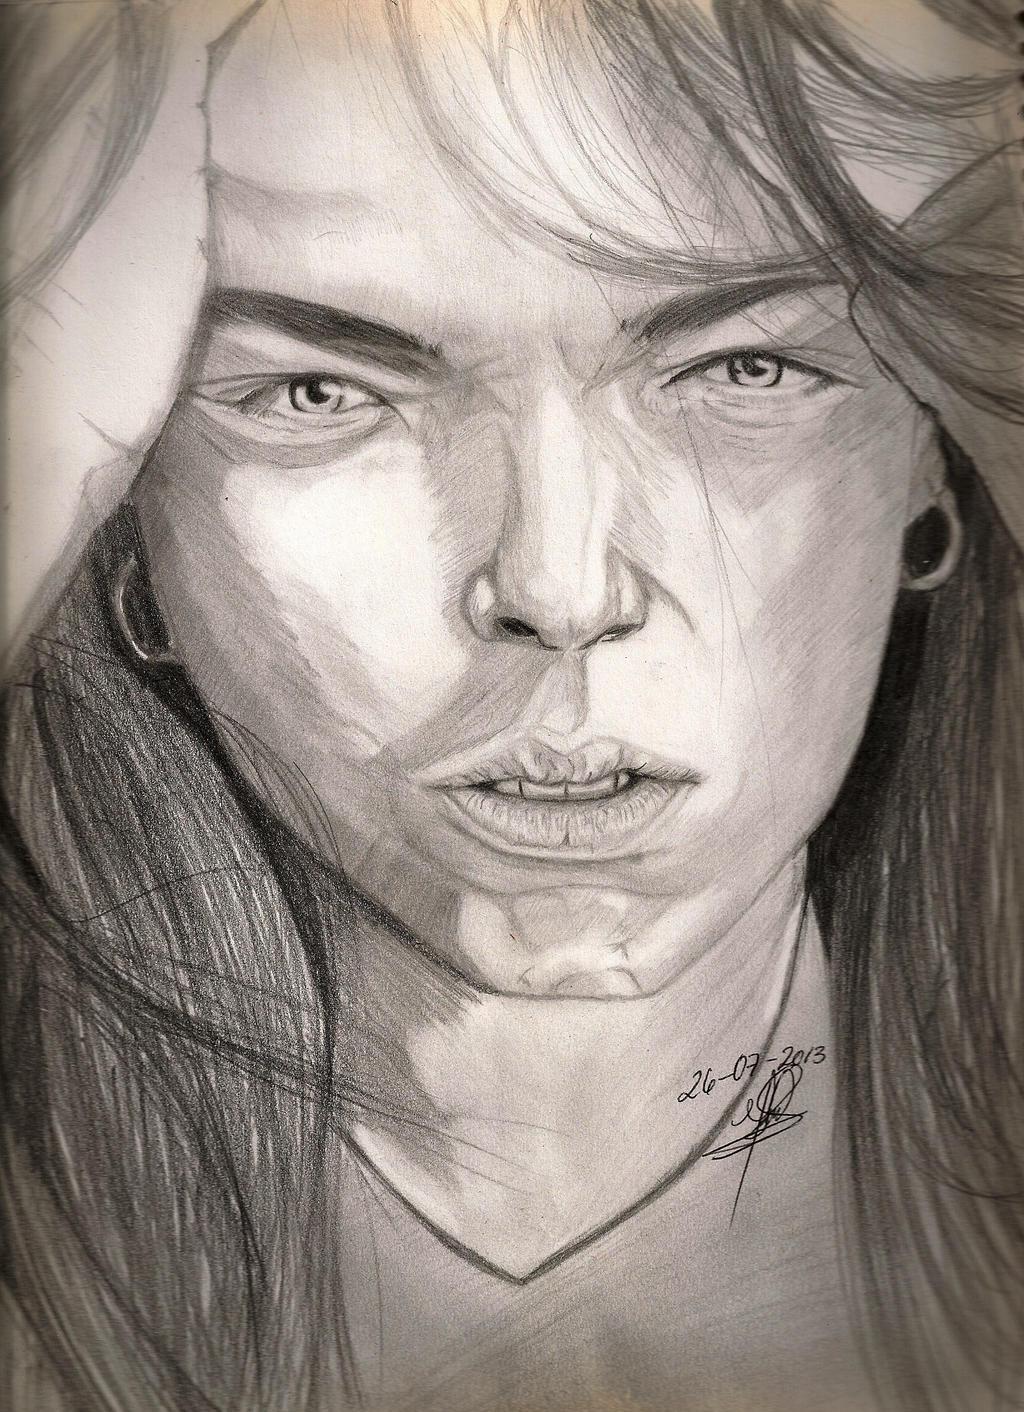 Eicca Toppinen by Andreina96 on DeviantArt